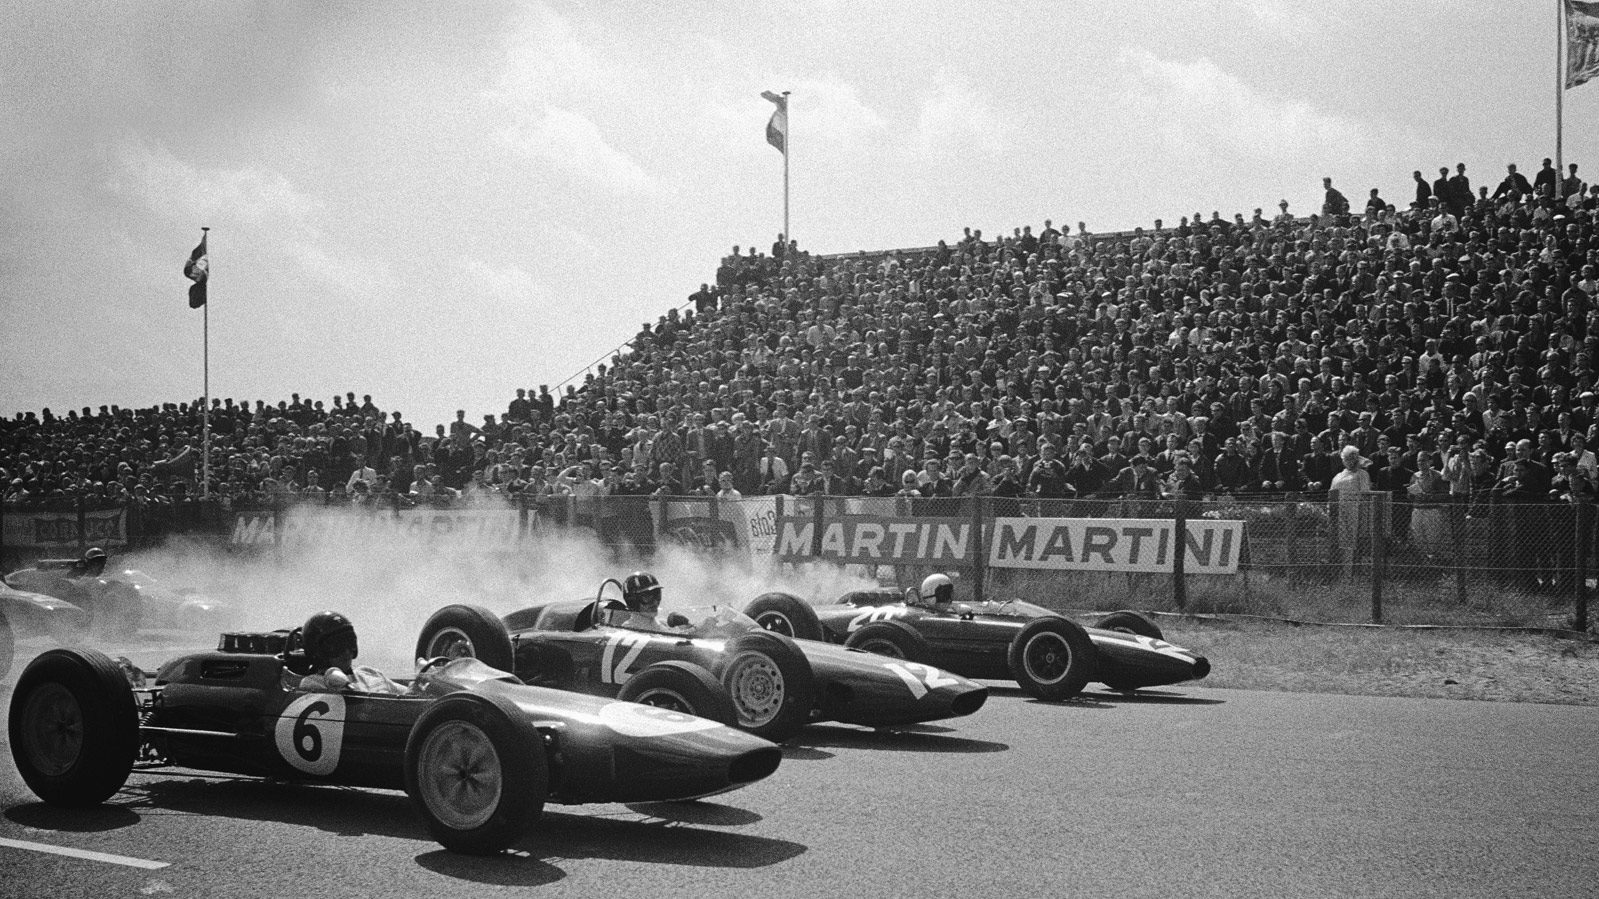 The Golden Age of Formula 1 by Rainer W. Schlegelmilch (teNeues)